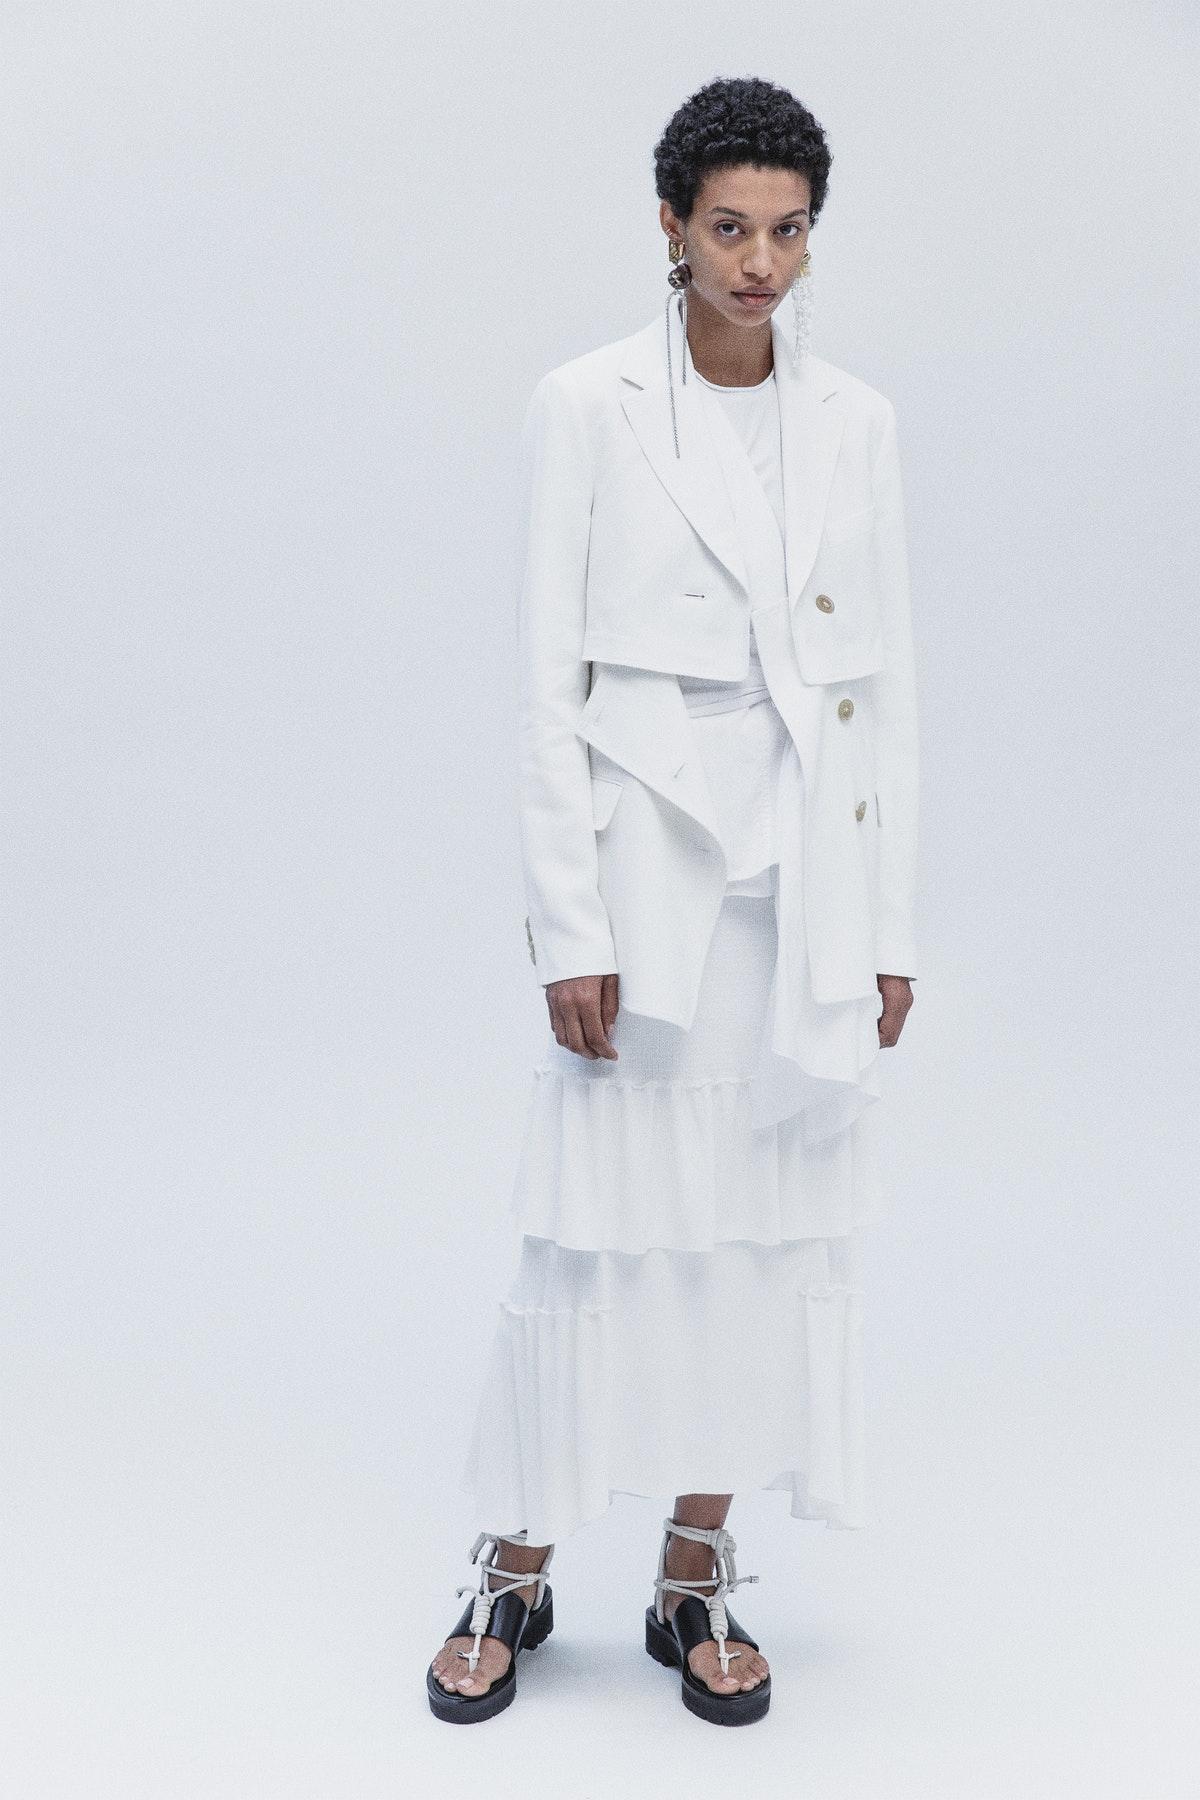 3.1 Phillip Lim Cruise 2018, image via The Business Of Fashion